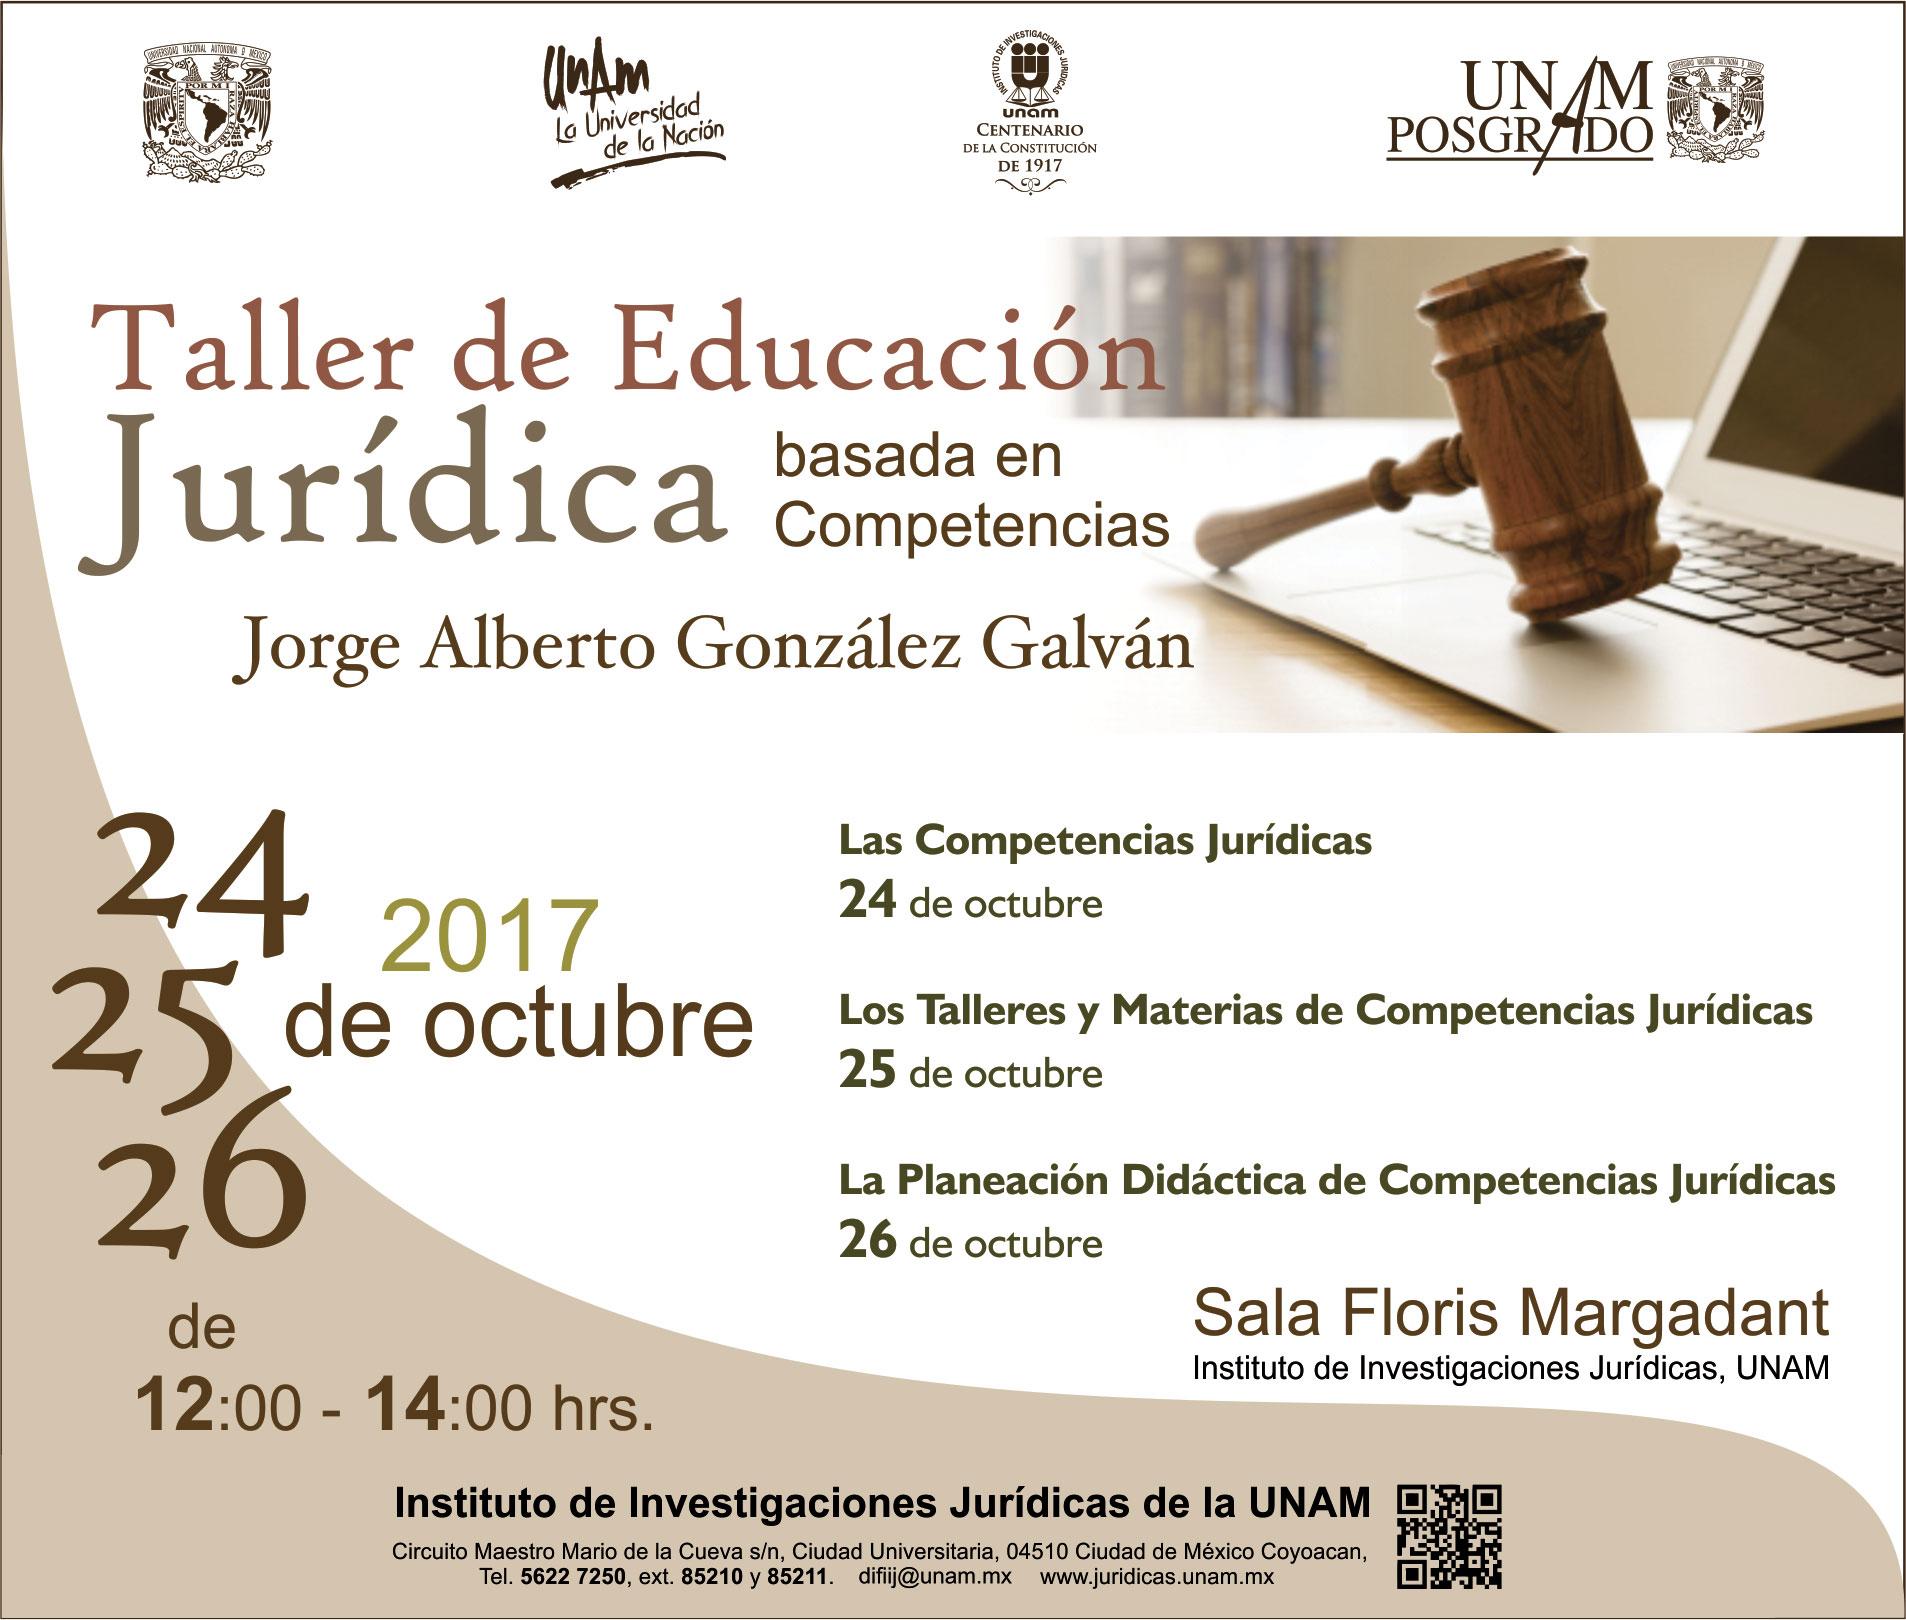 Taller de educación jurídica basada en competencias